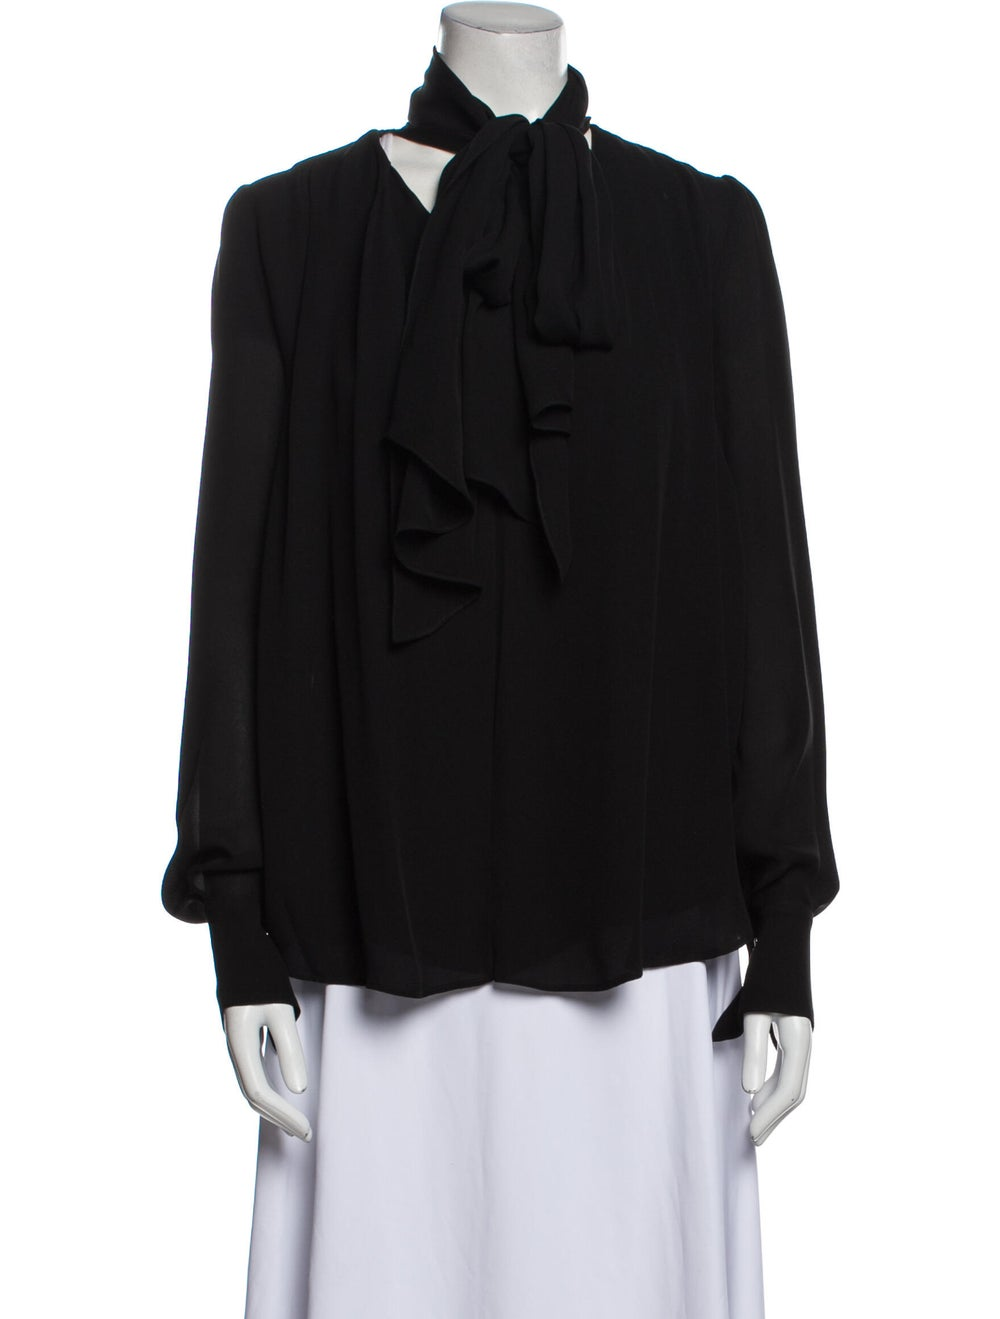 Plein Sud Silk Mock Neck Blouse Black - image 1